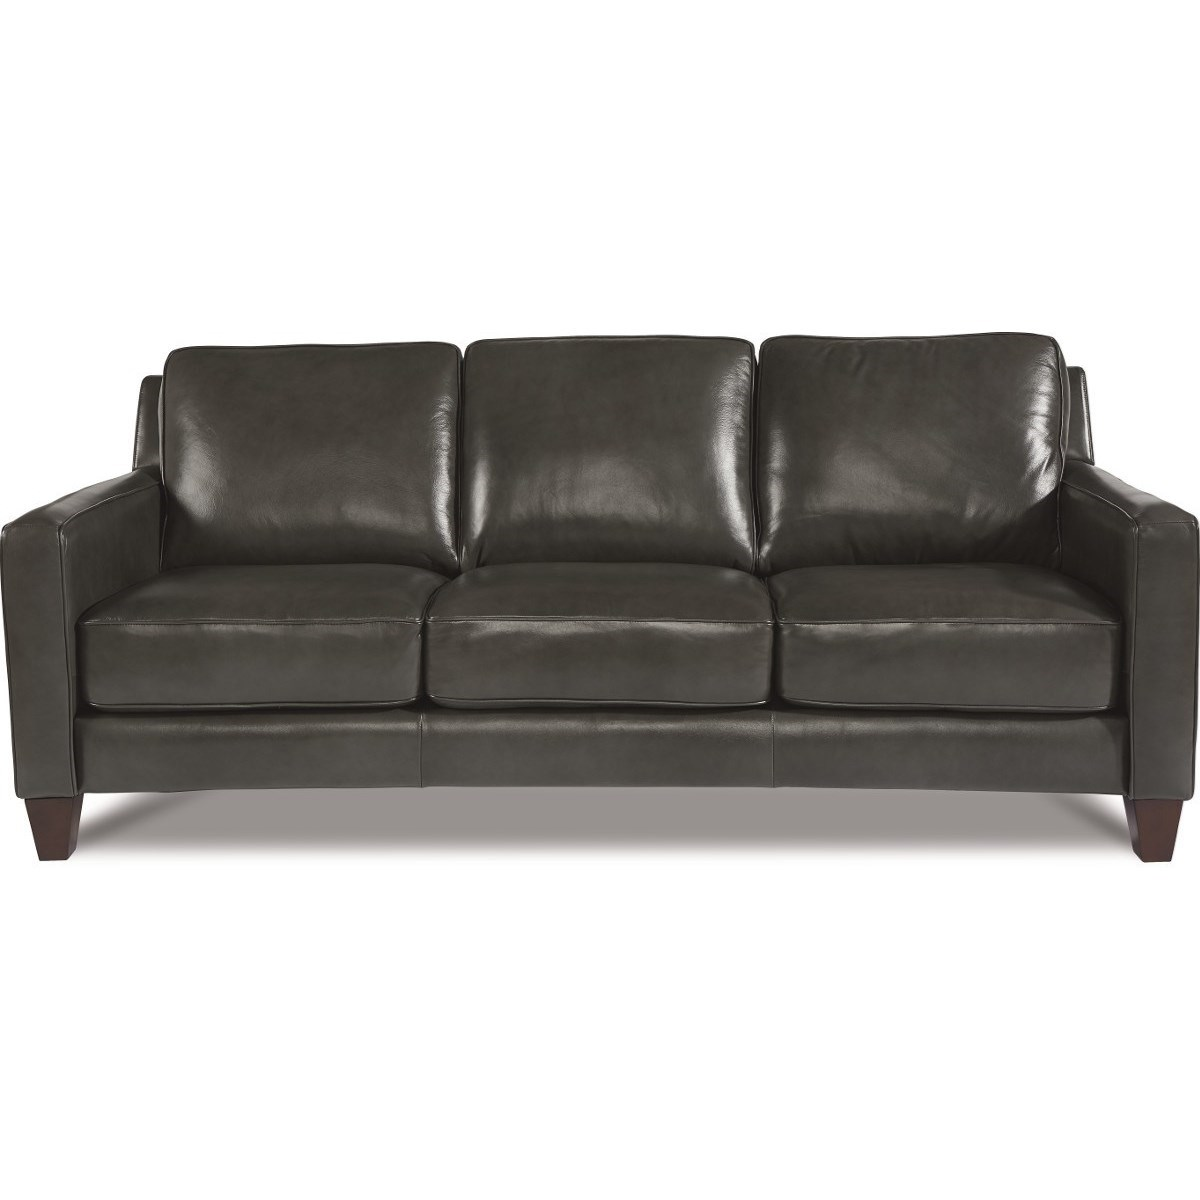 Archer Sofa by La-Z-Boy at Houston's Yuma Furniture